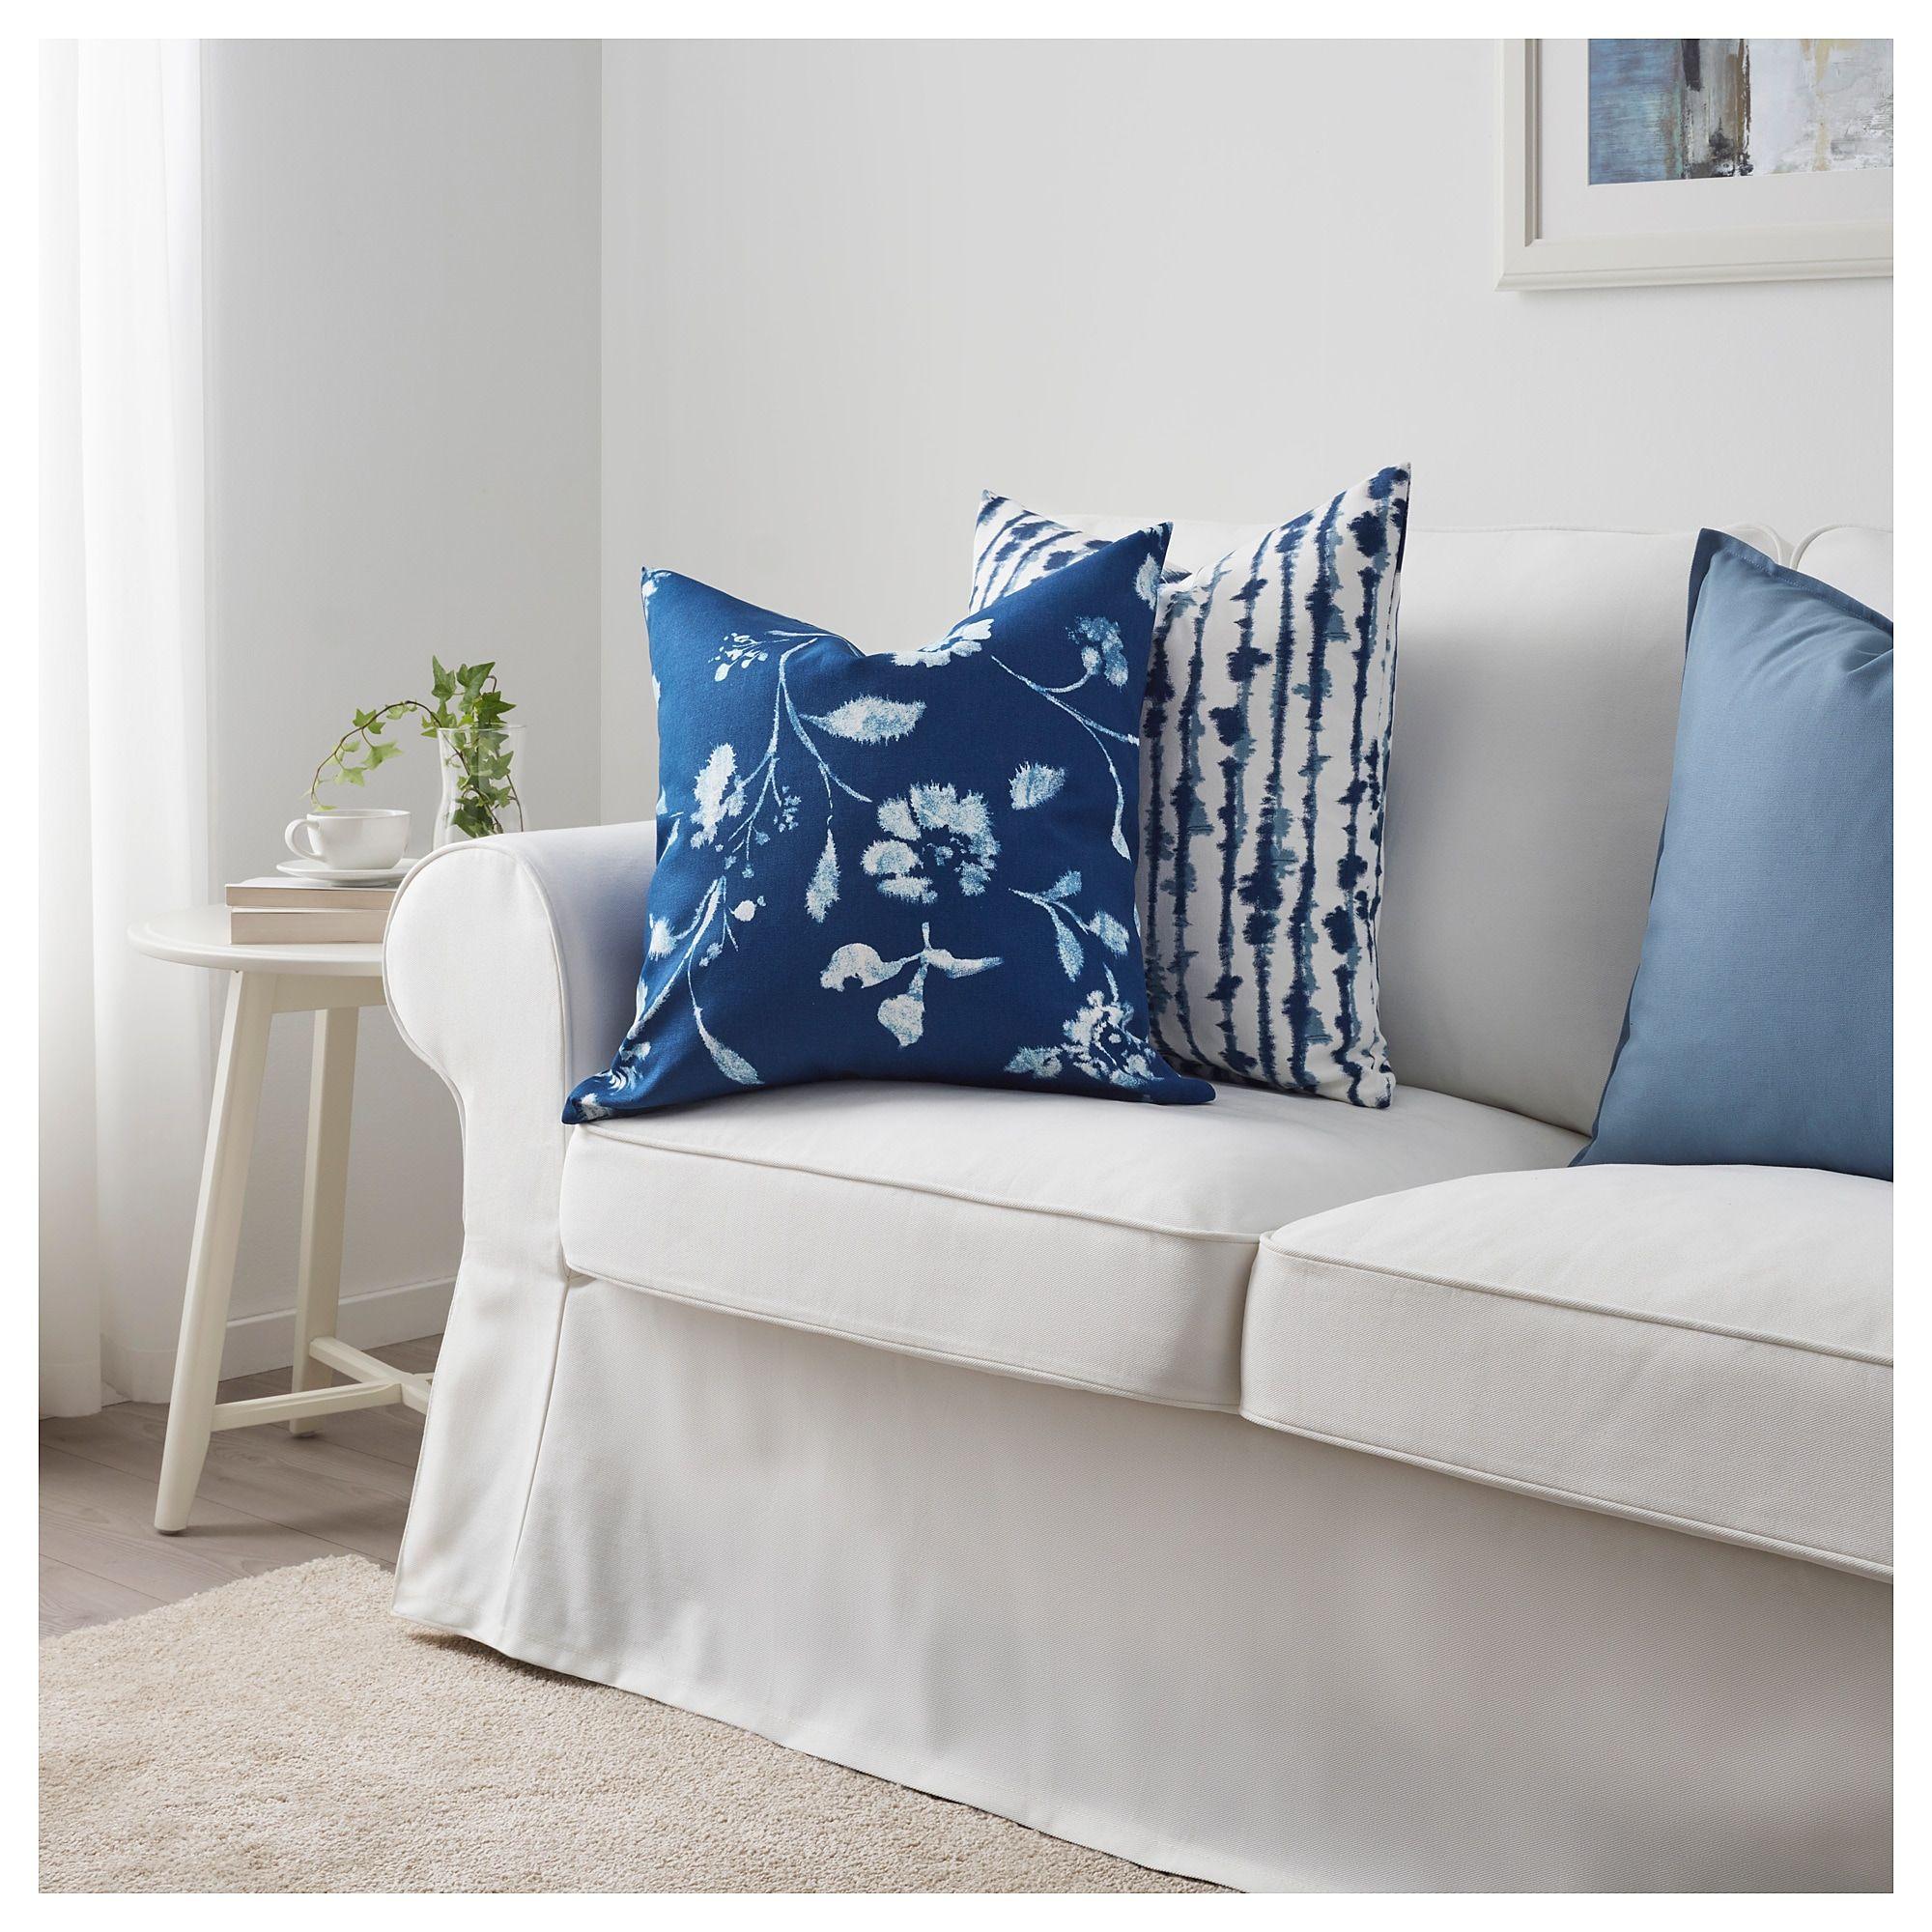 Blagran Kissenbezug Blau Weiss Kissenbezuge Ikea Inspiration